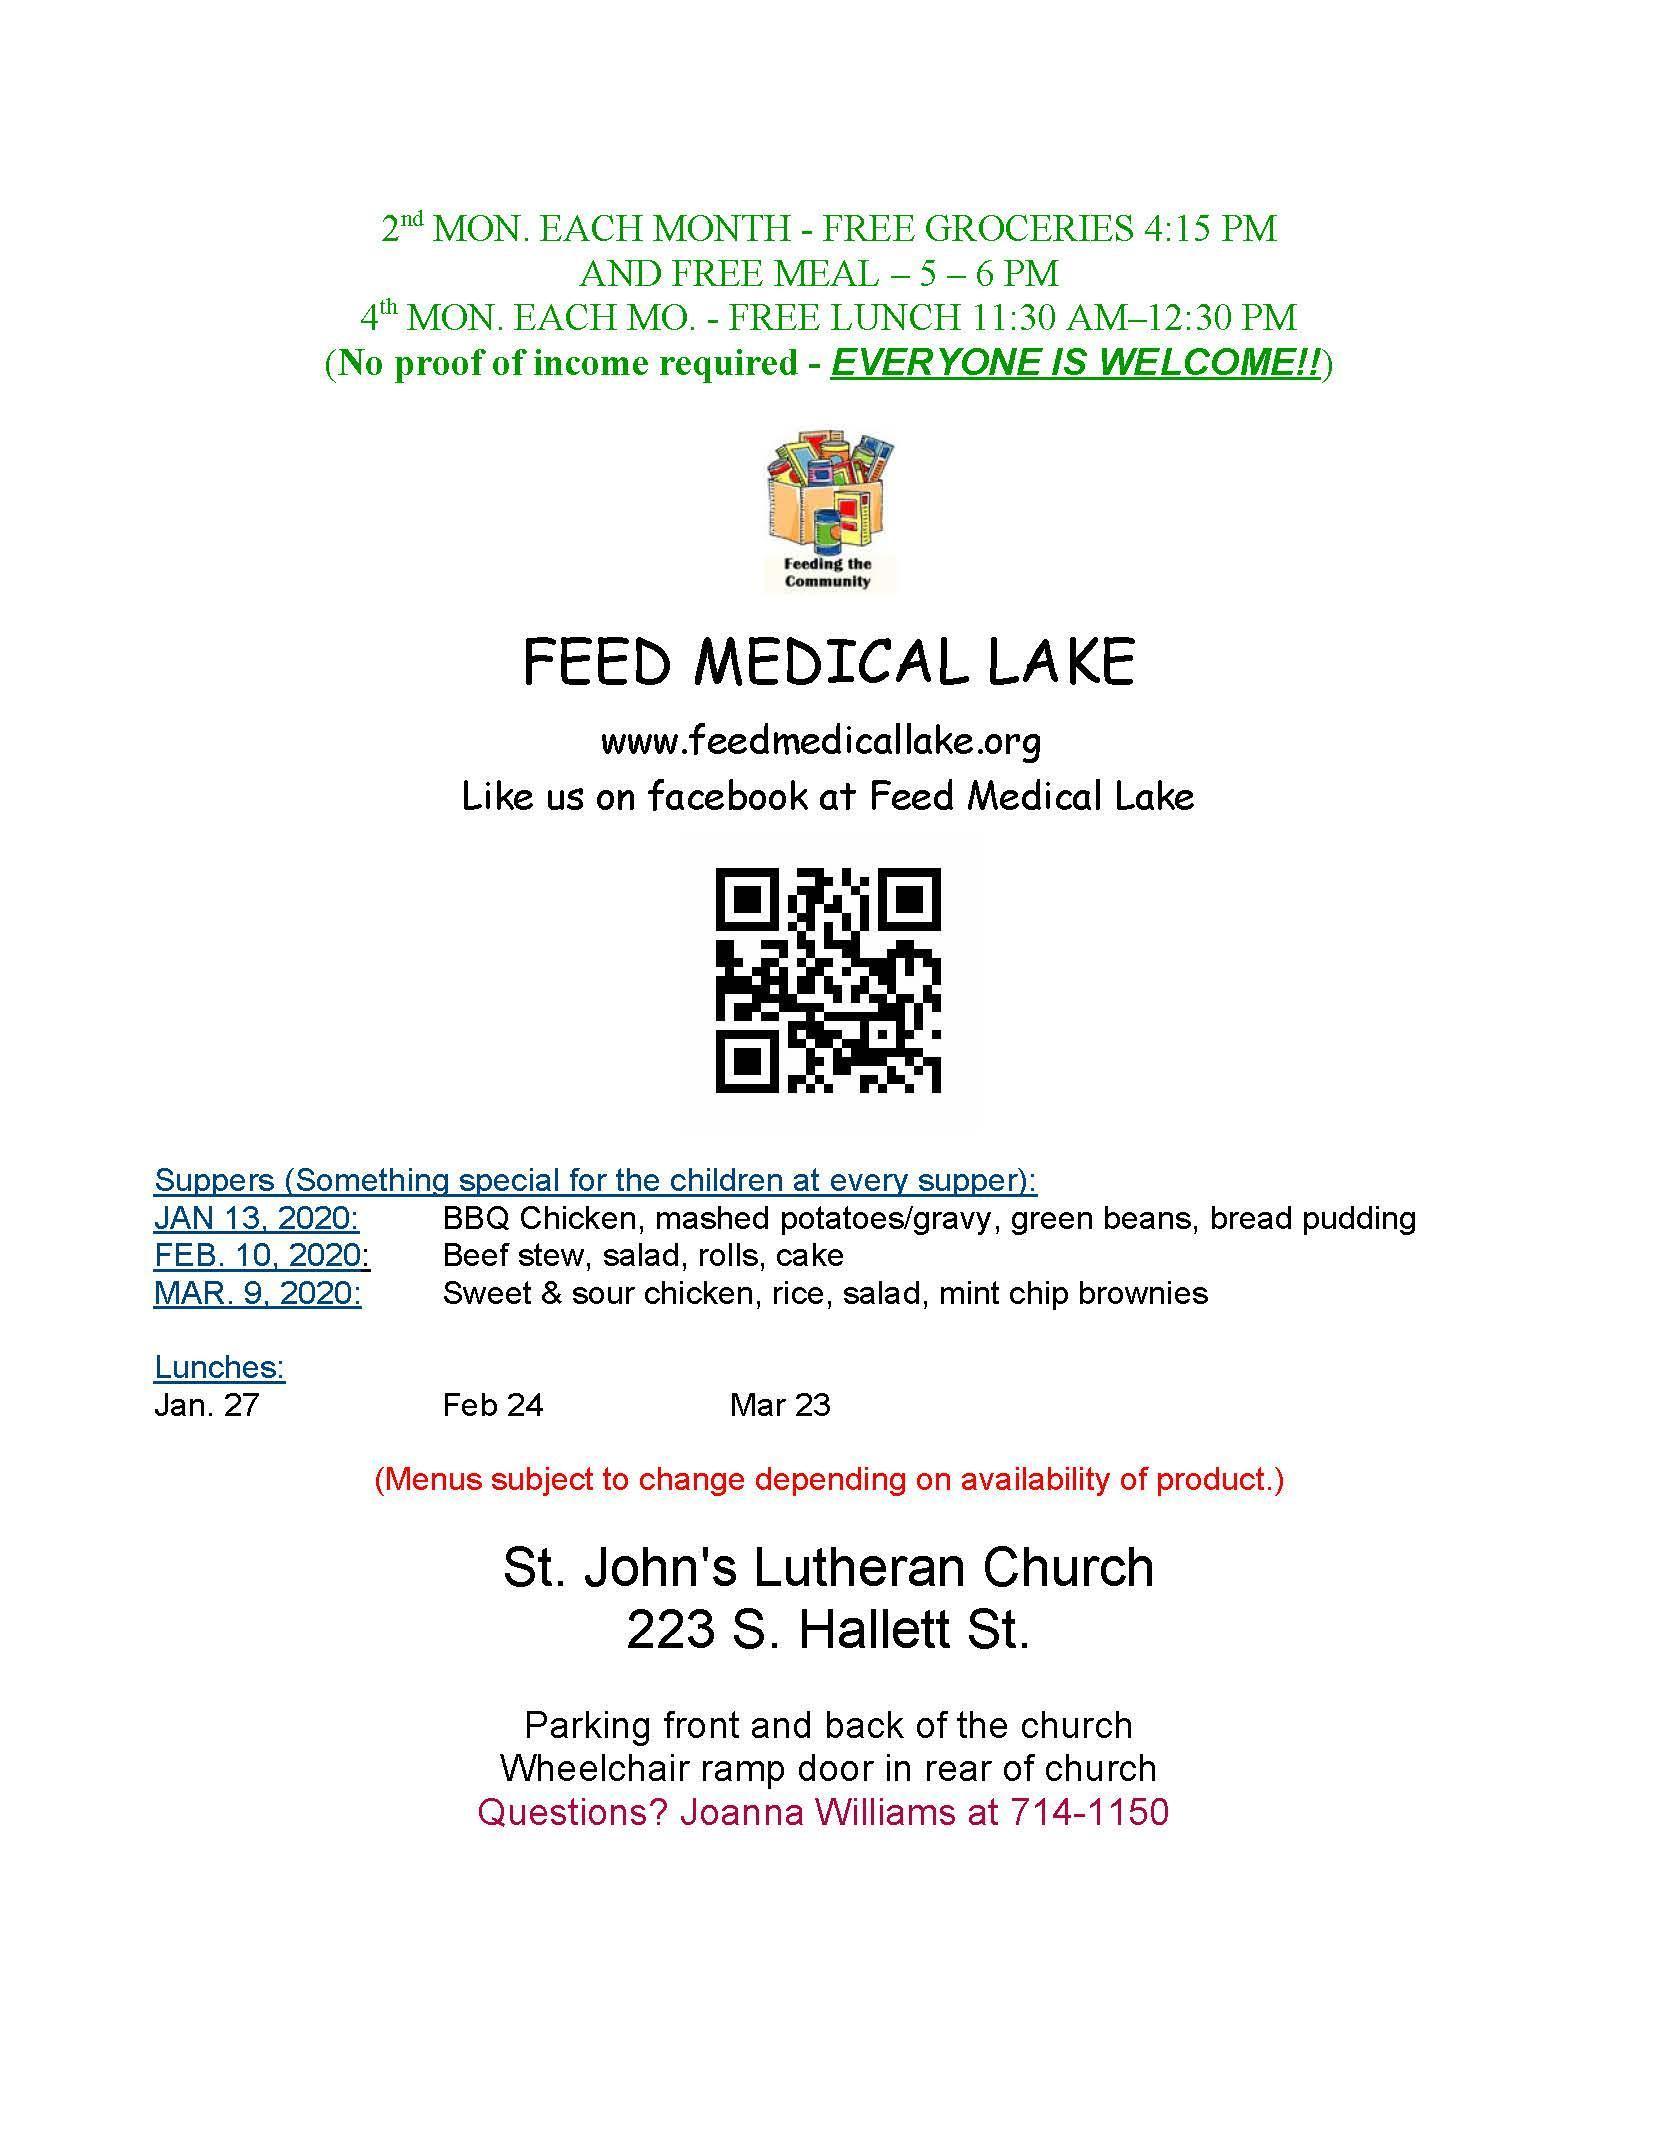 Feed Medical Lake Menu through March 2020